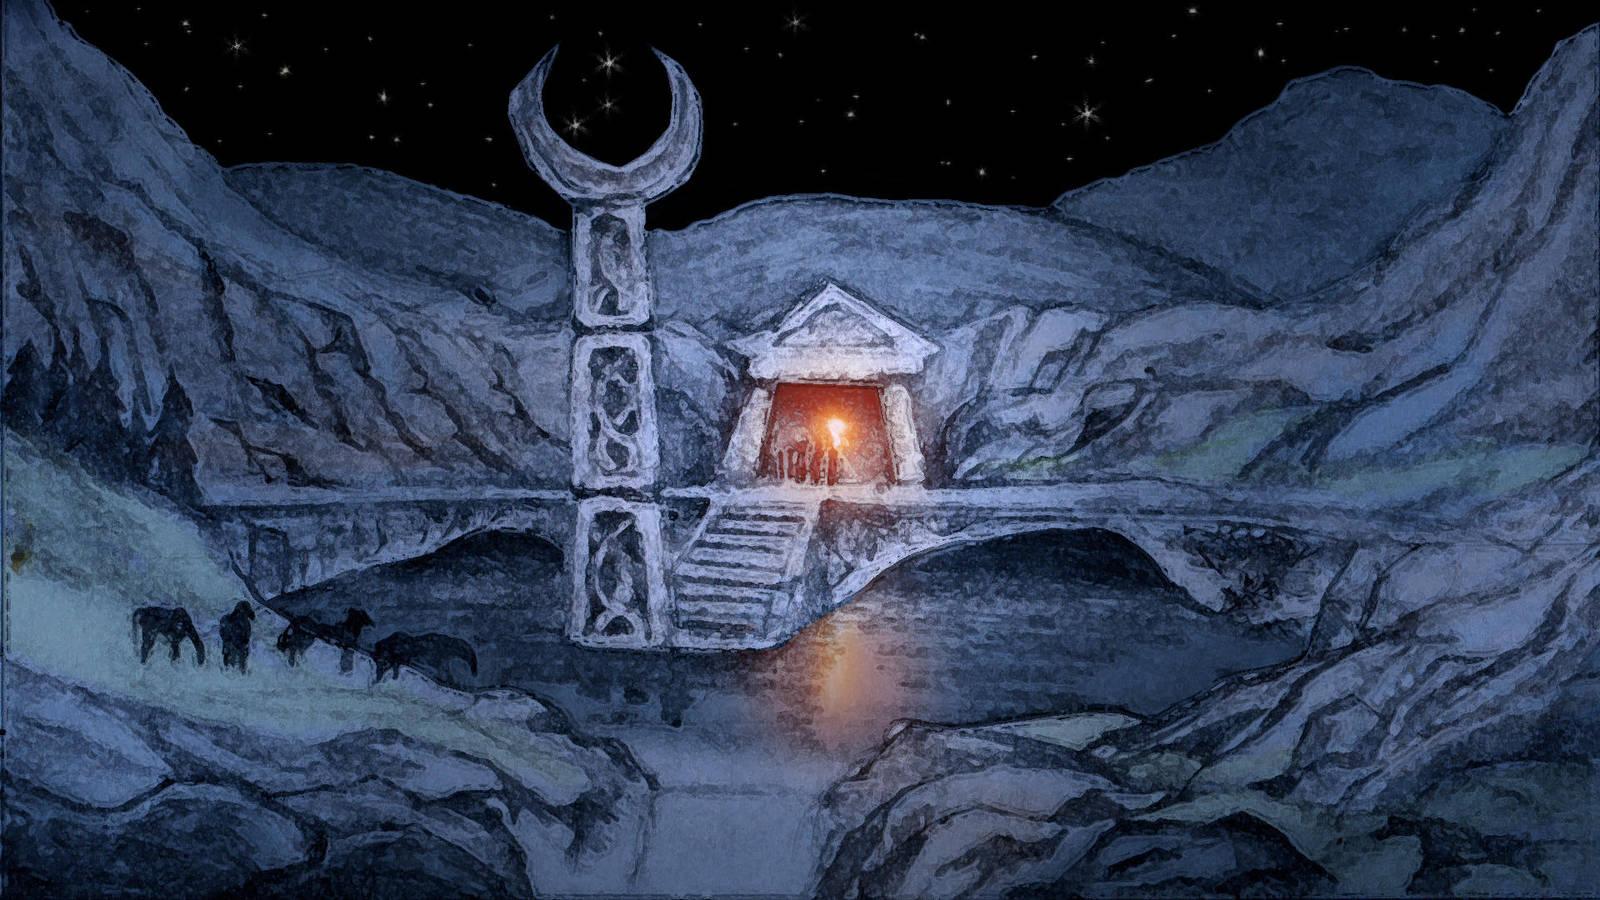 The Pool Of the Moon(HuntersMoon Storyboard) by CareldeWinter